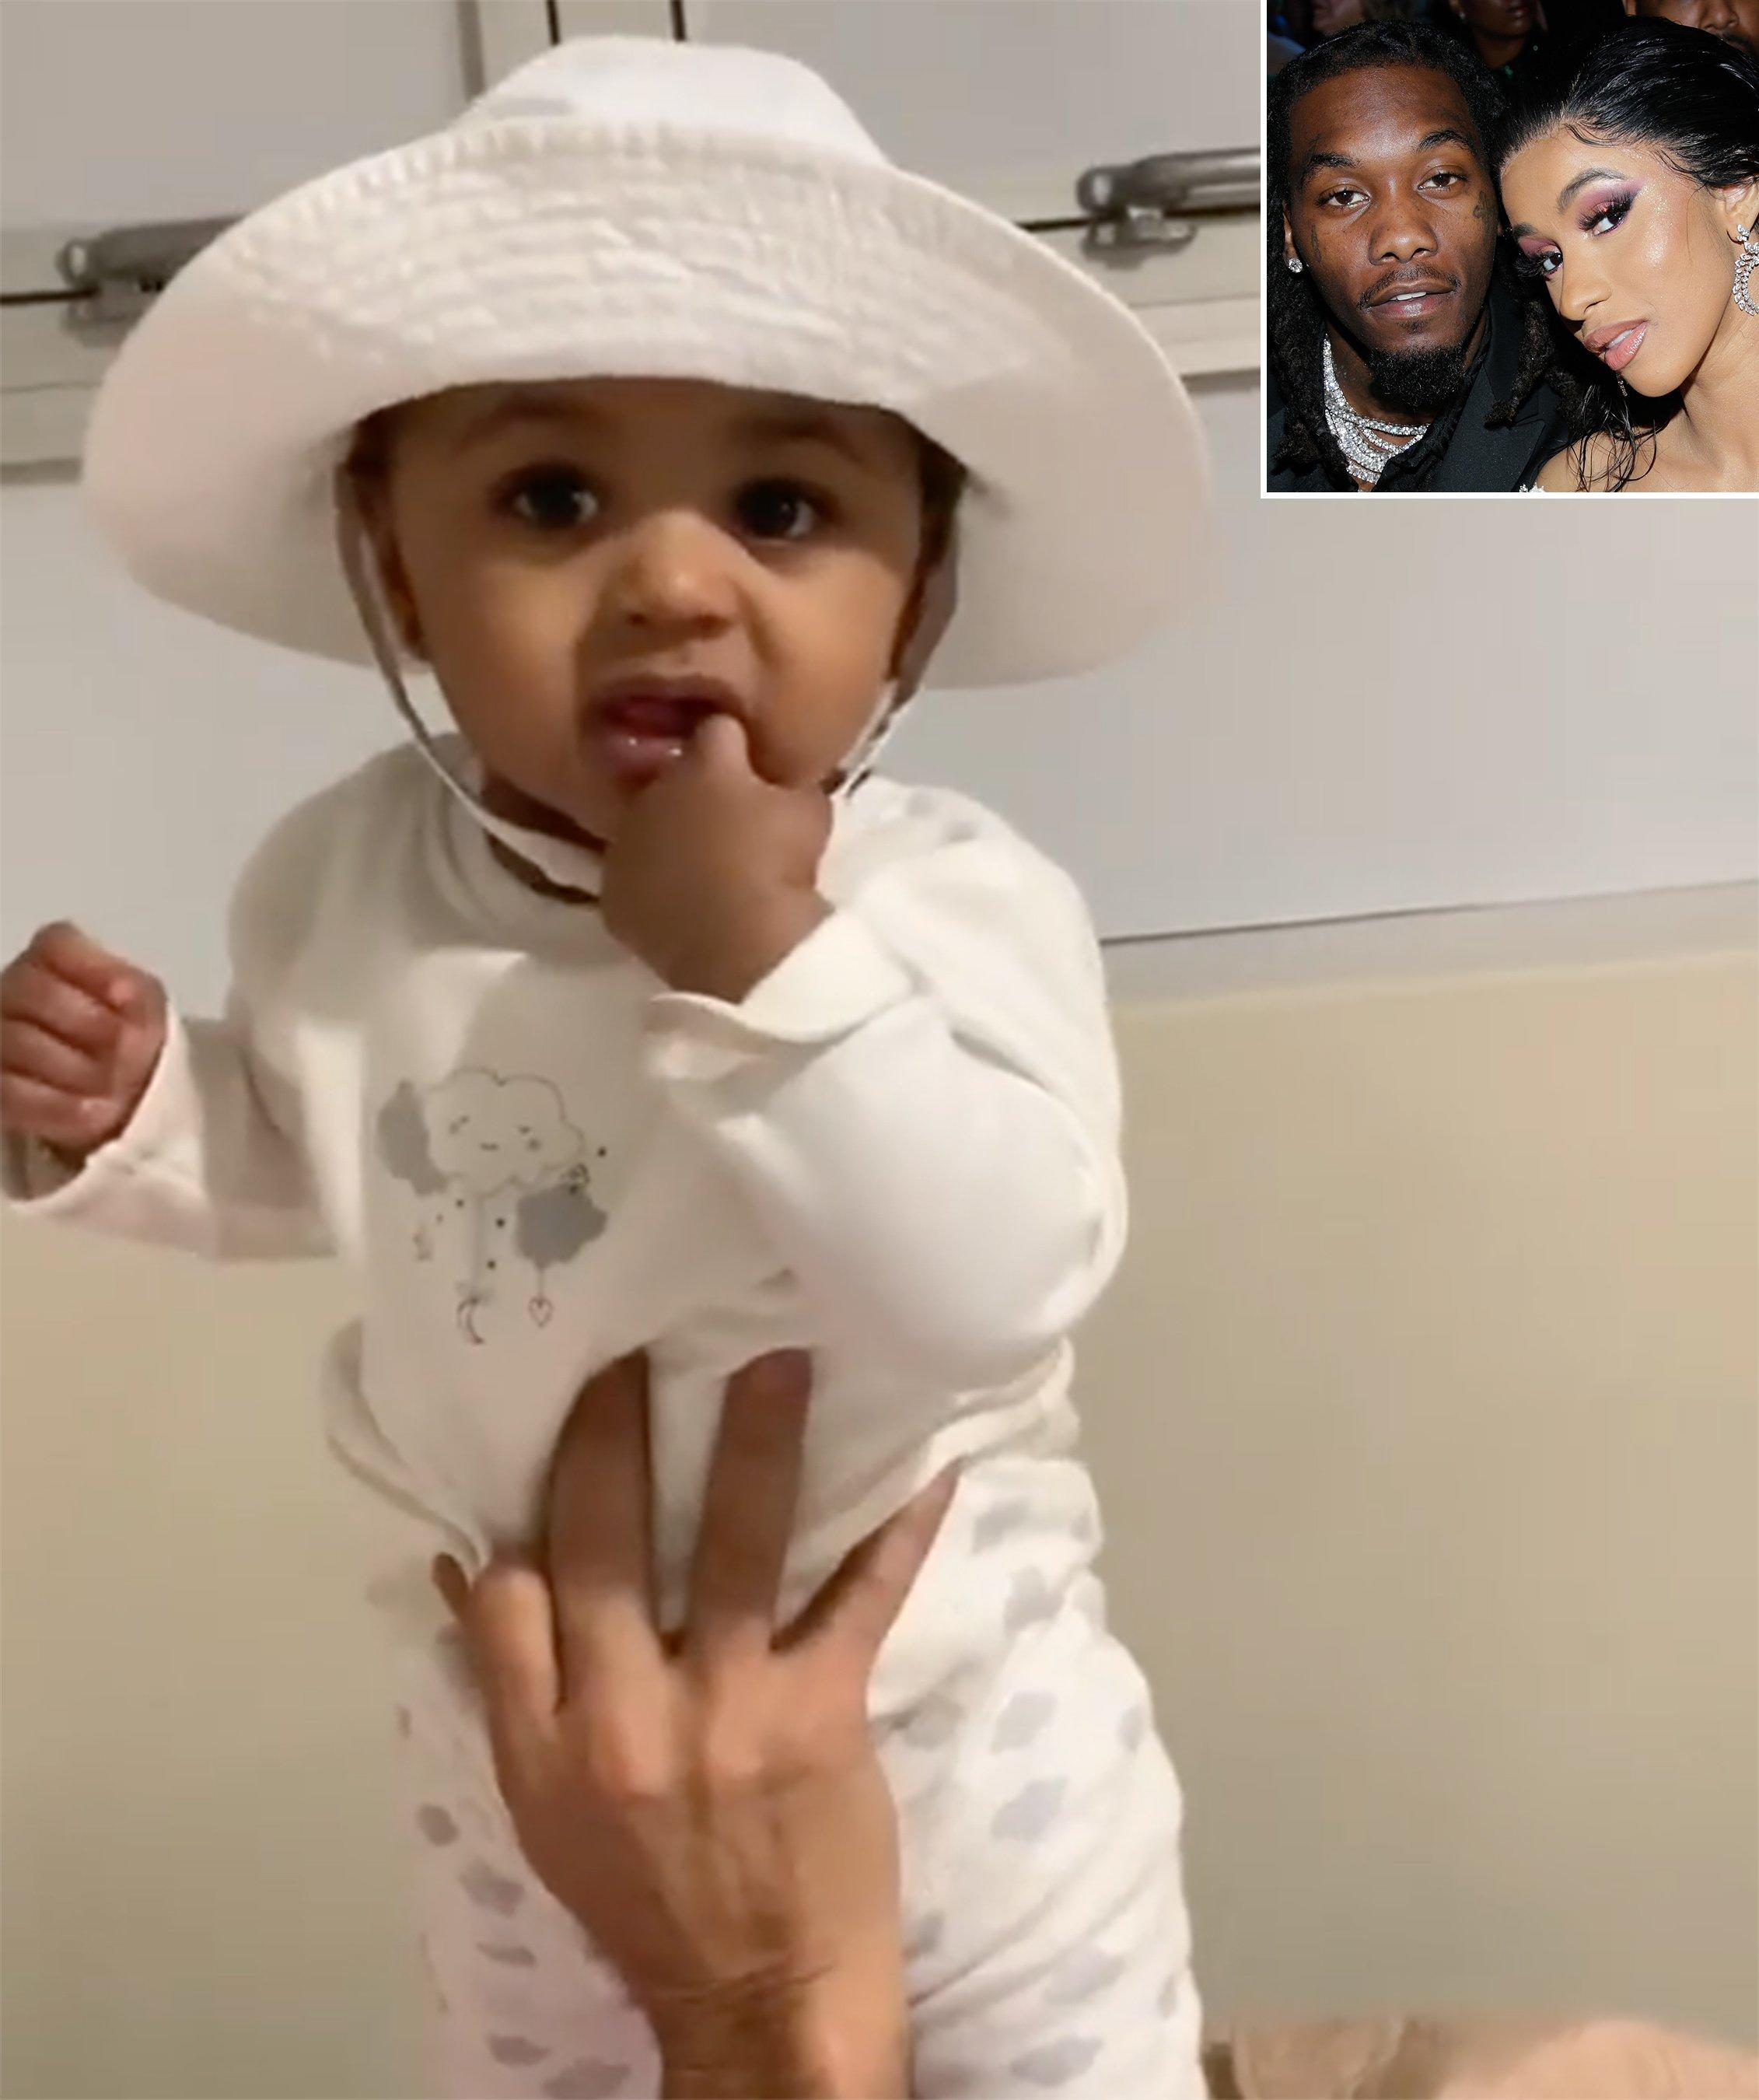 Offset Shares Sweet Video Of Daughter Kulture, 8 Months